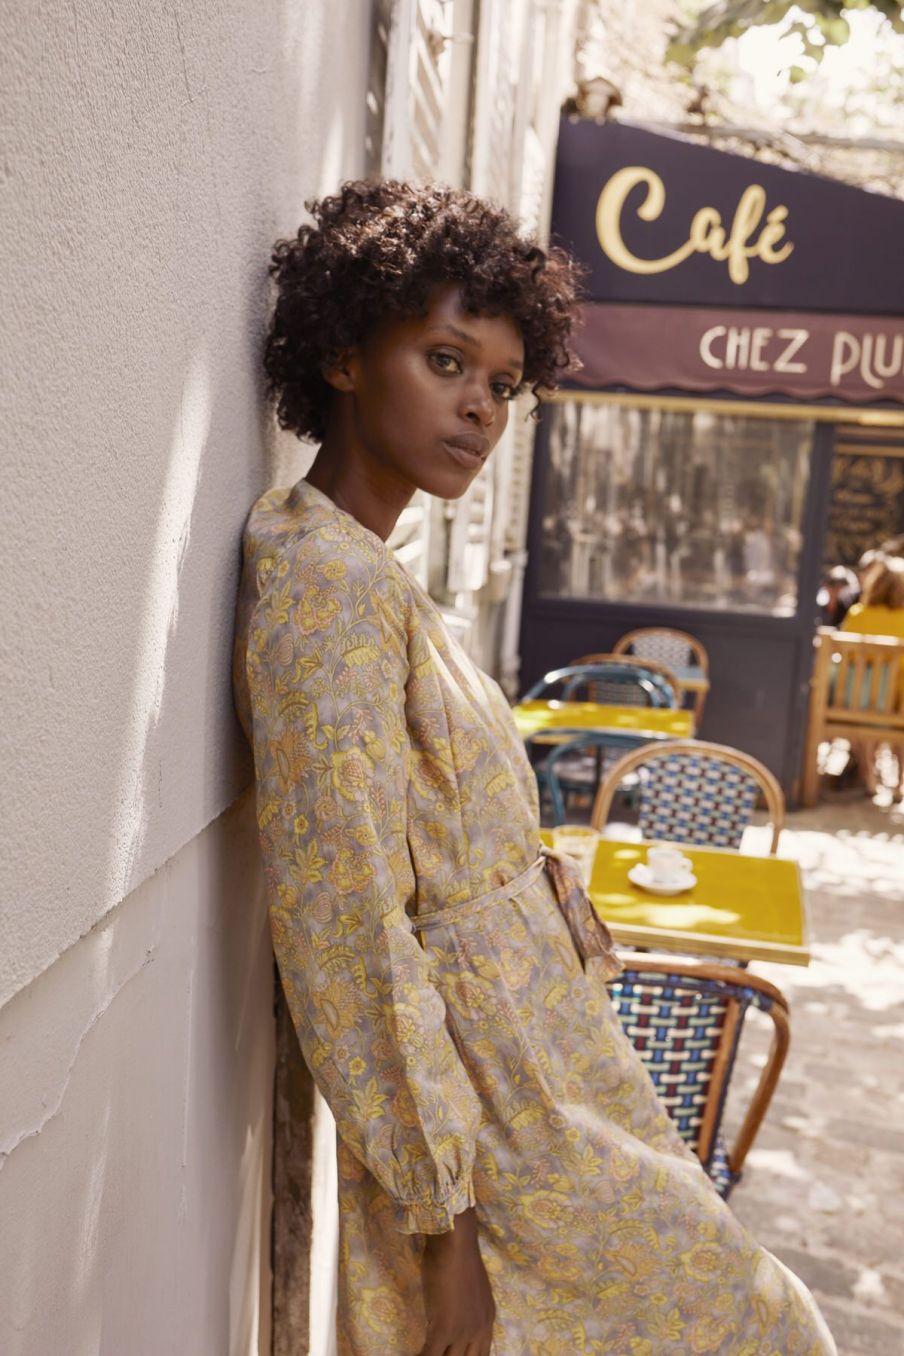 boheme chic vintage robe femme rama grey california flowers